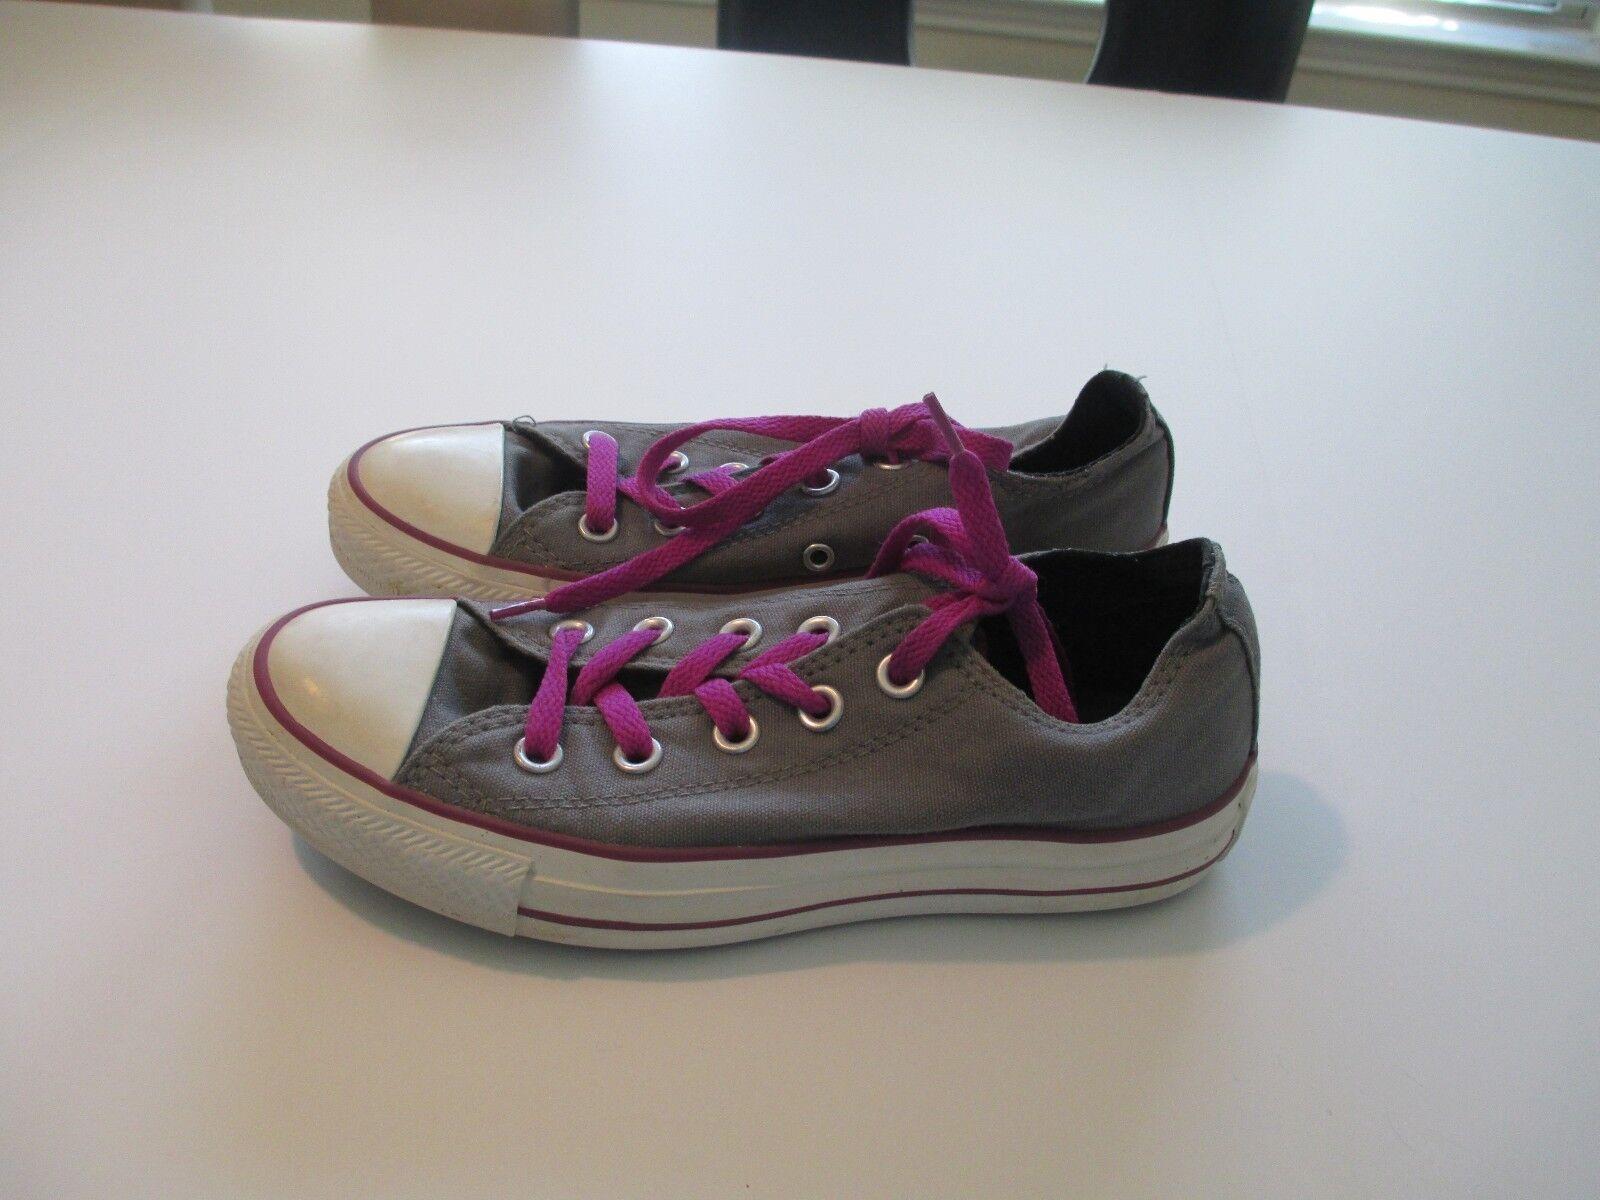 Converse All Star Tan Women's US Shoes 6  Tennis Sneaker Shoes US Free Ship 3c6e93